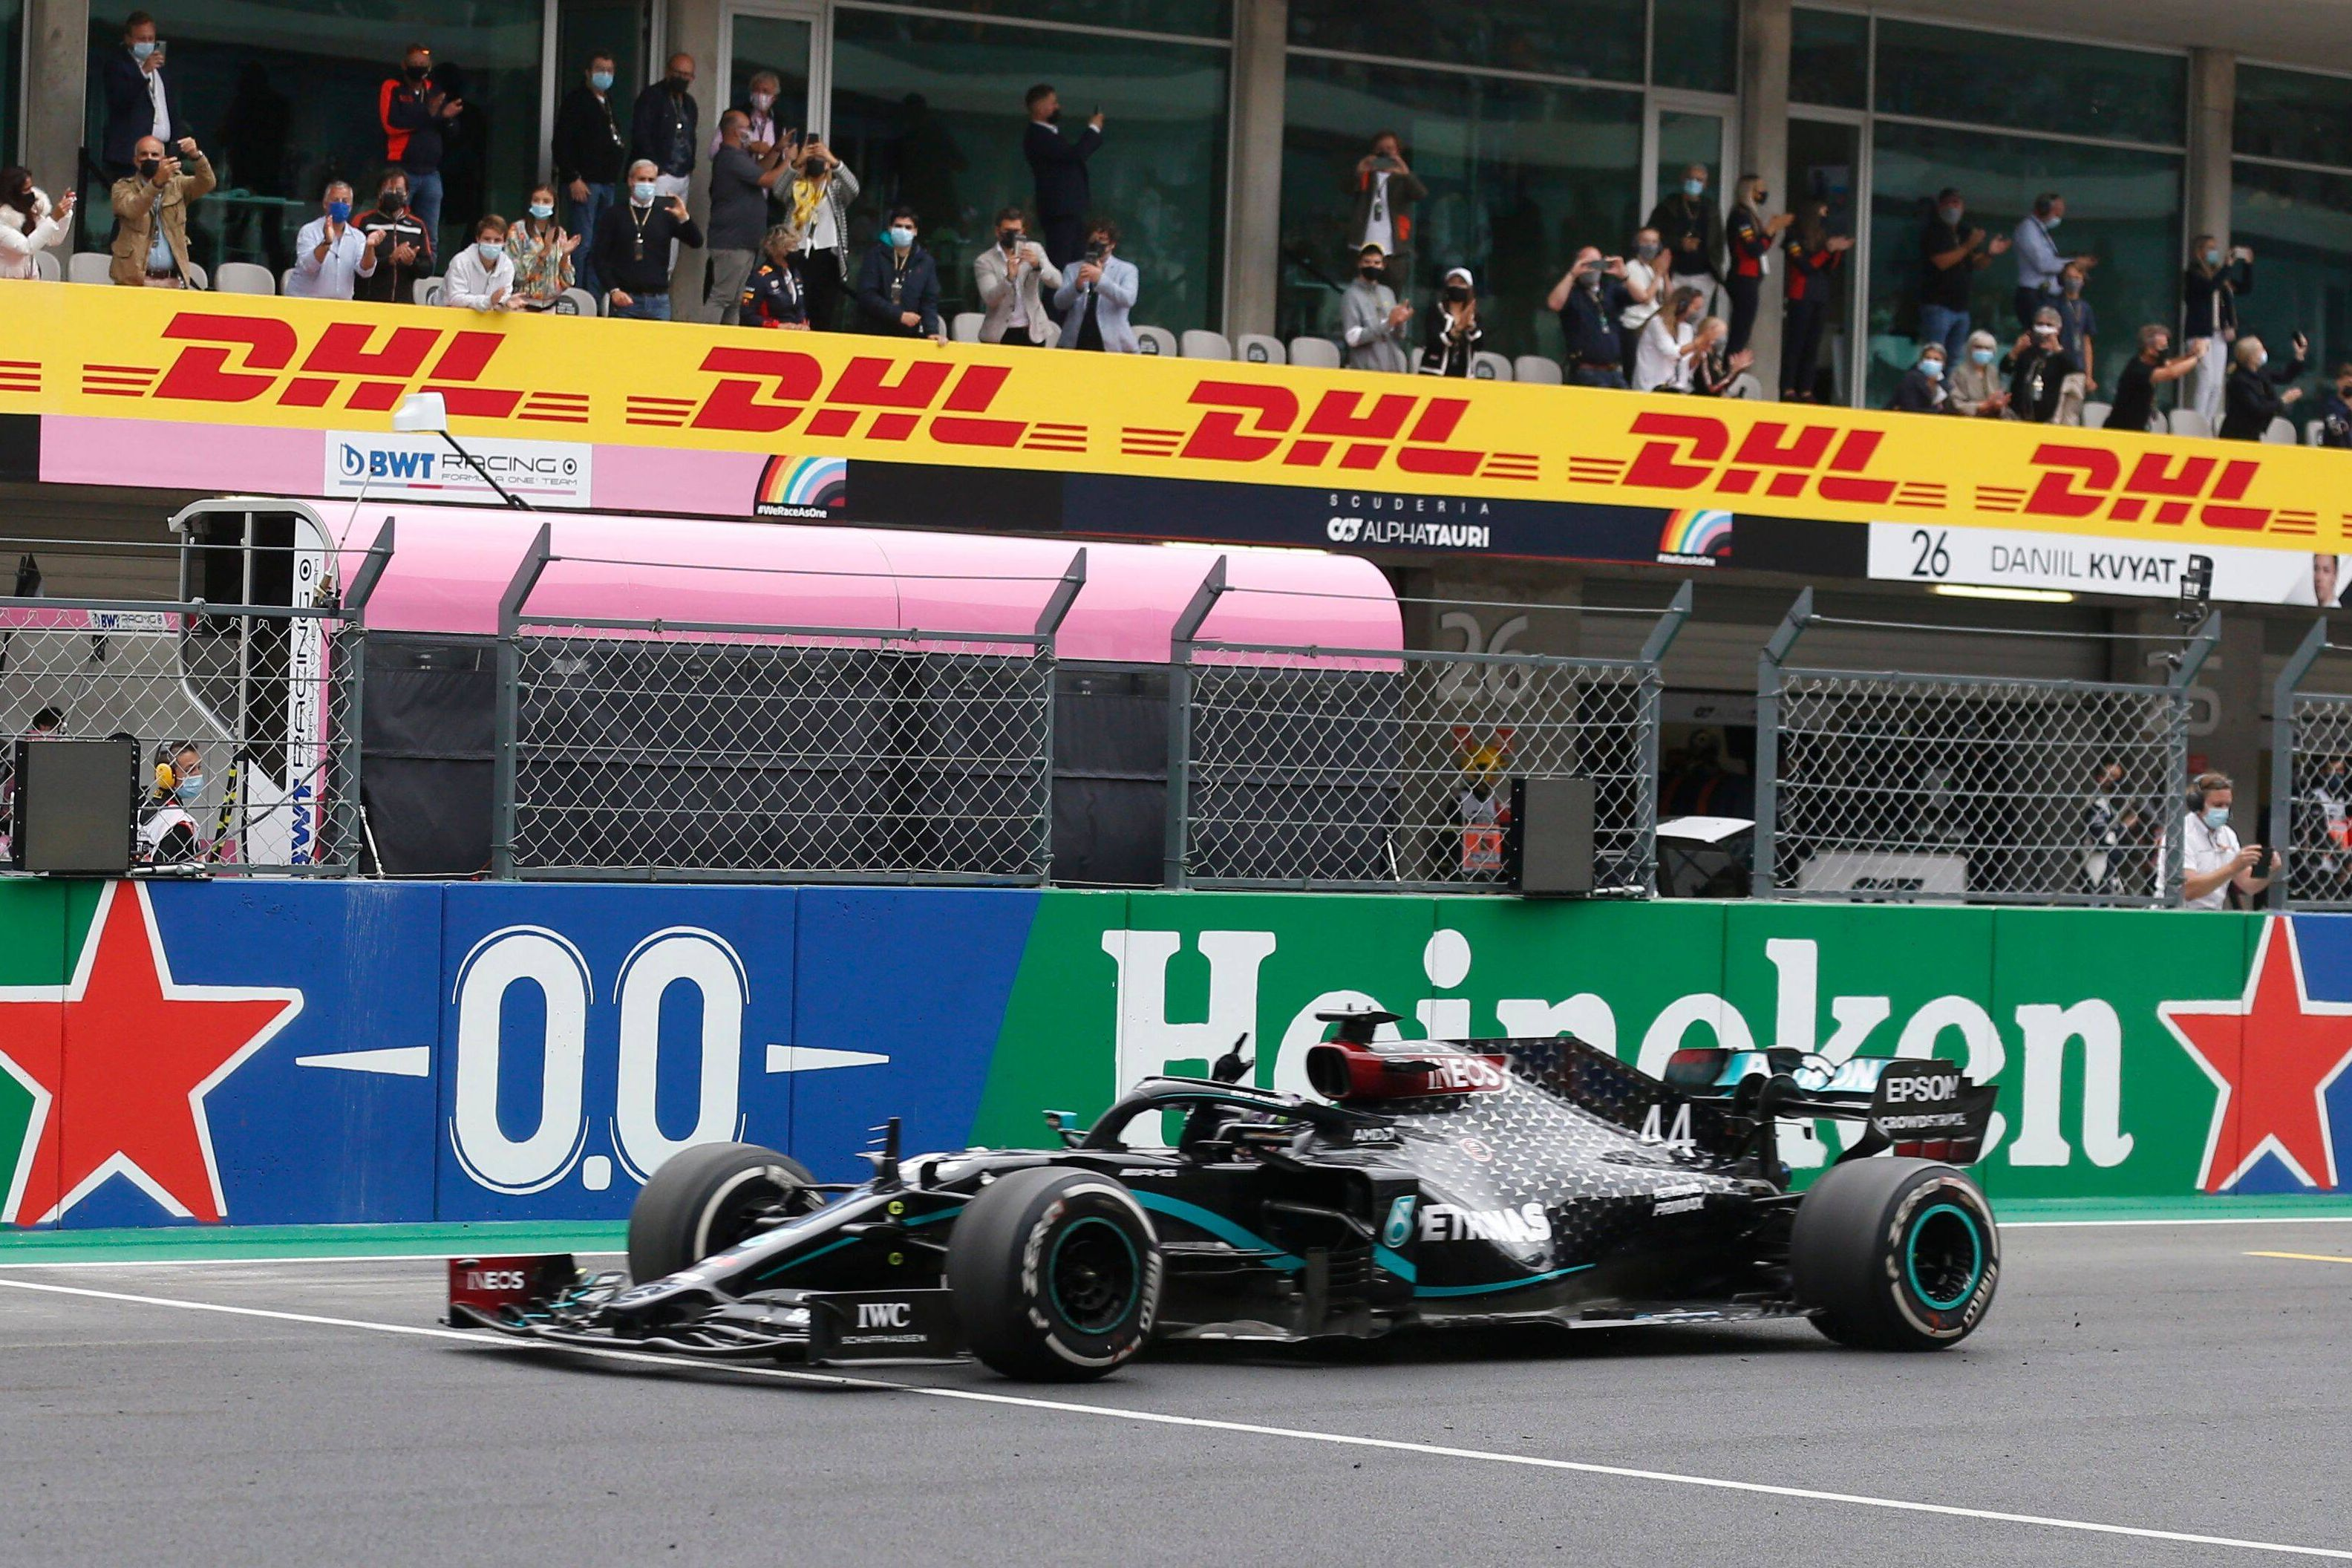 Формула-1. Гран-при Эмилии-Романьи. Квалификация. Прямая трансляция